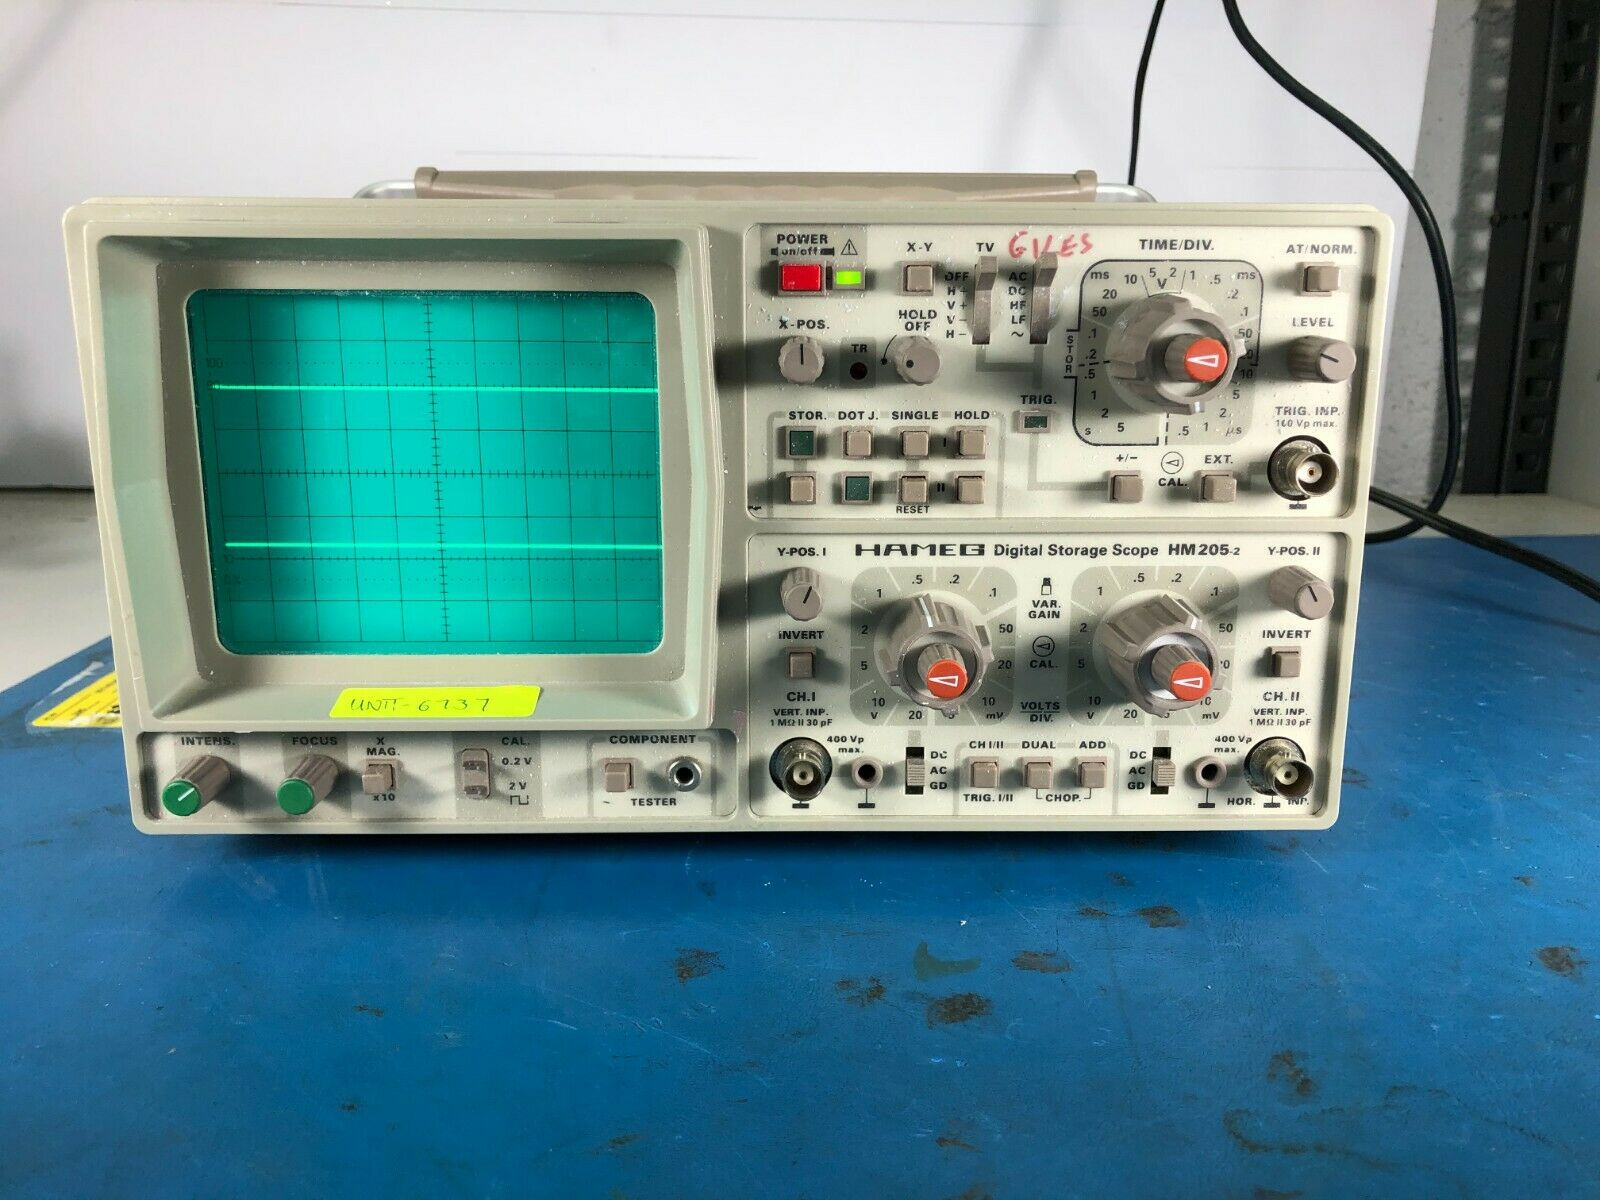 Hameg Instruments Oscilloscope HM 408 Analog Digital Speicher Oszilloskop